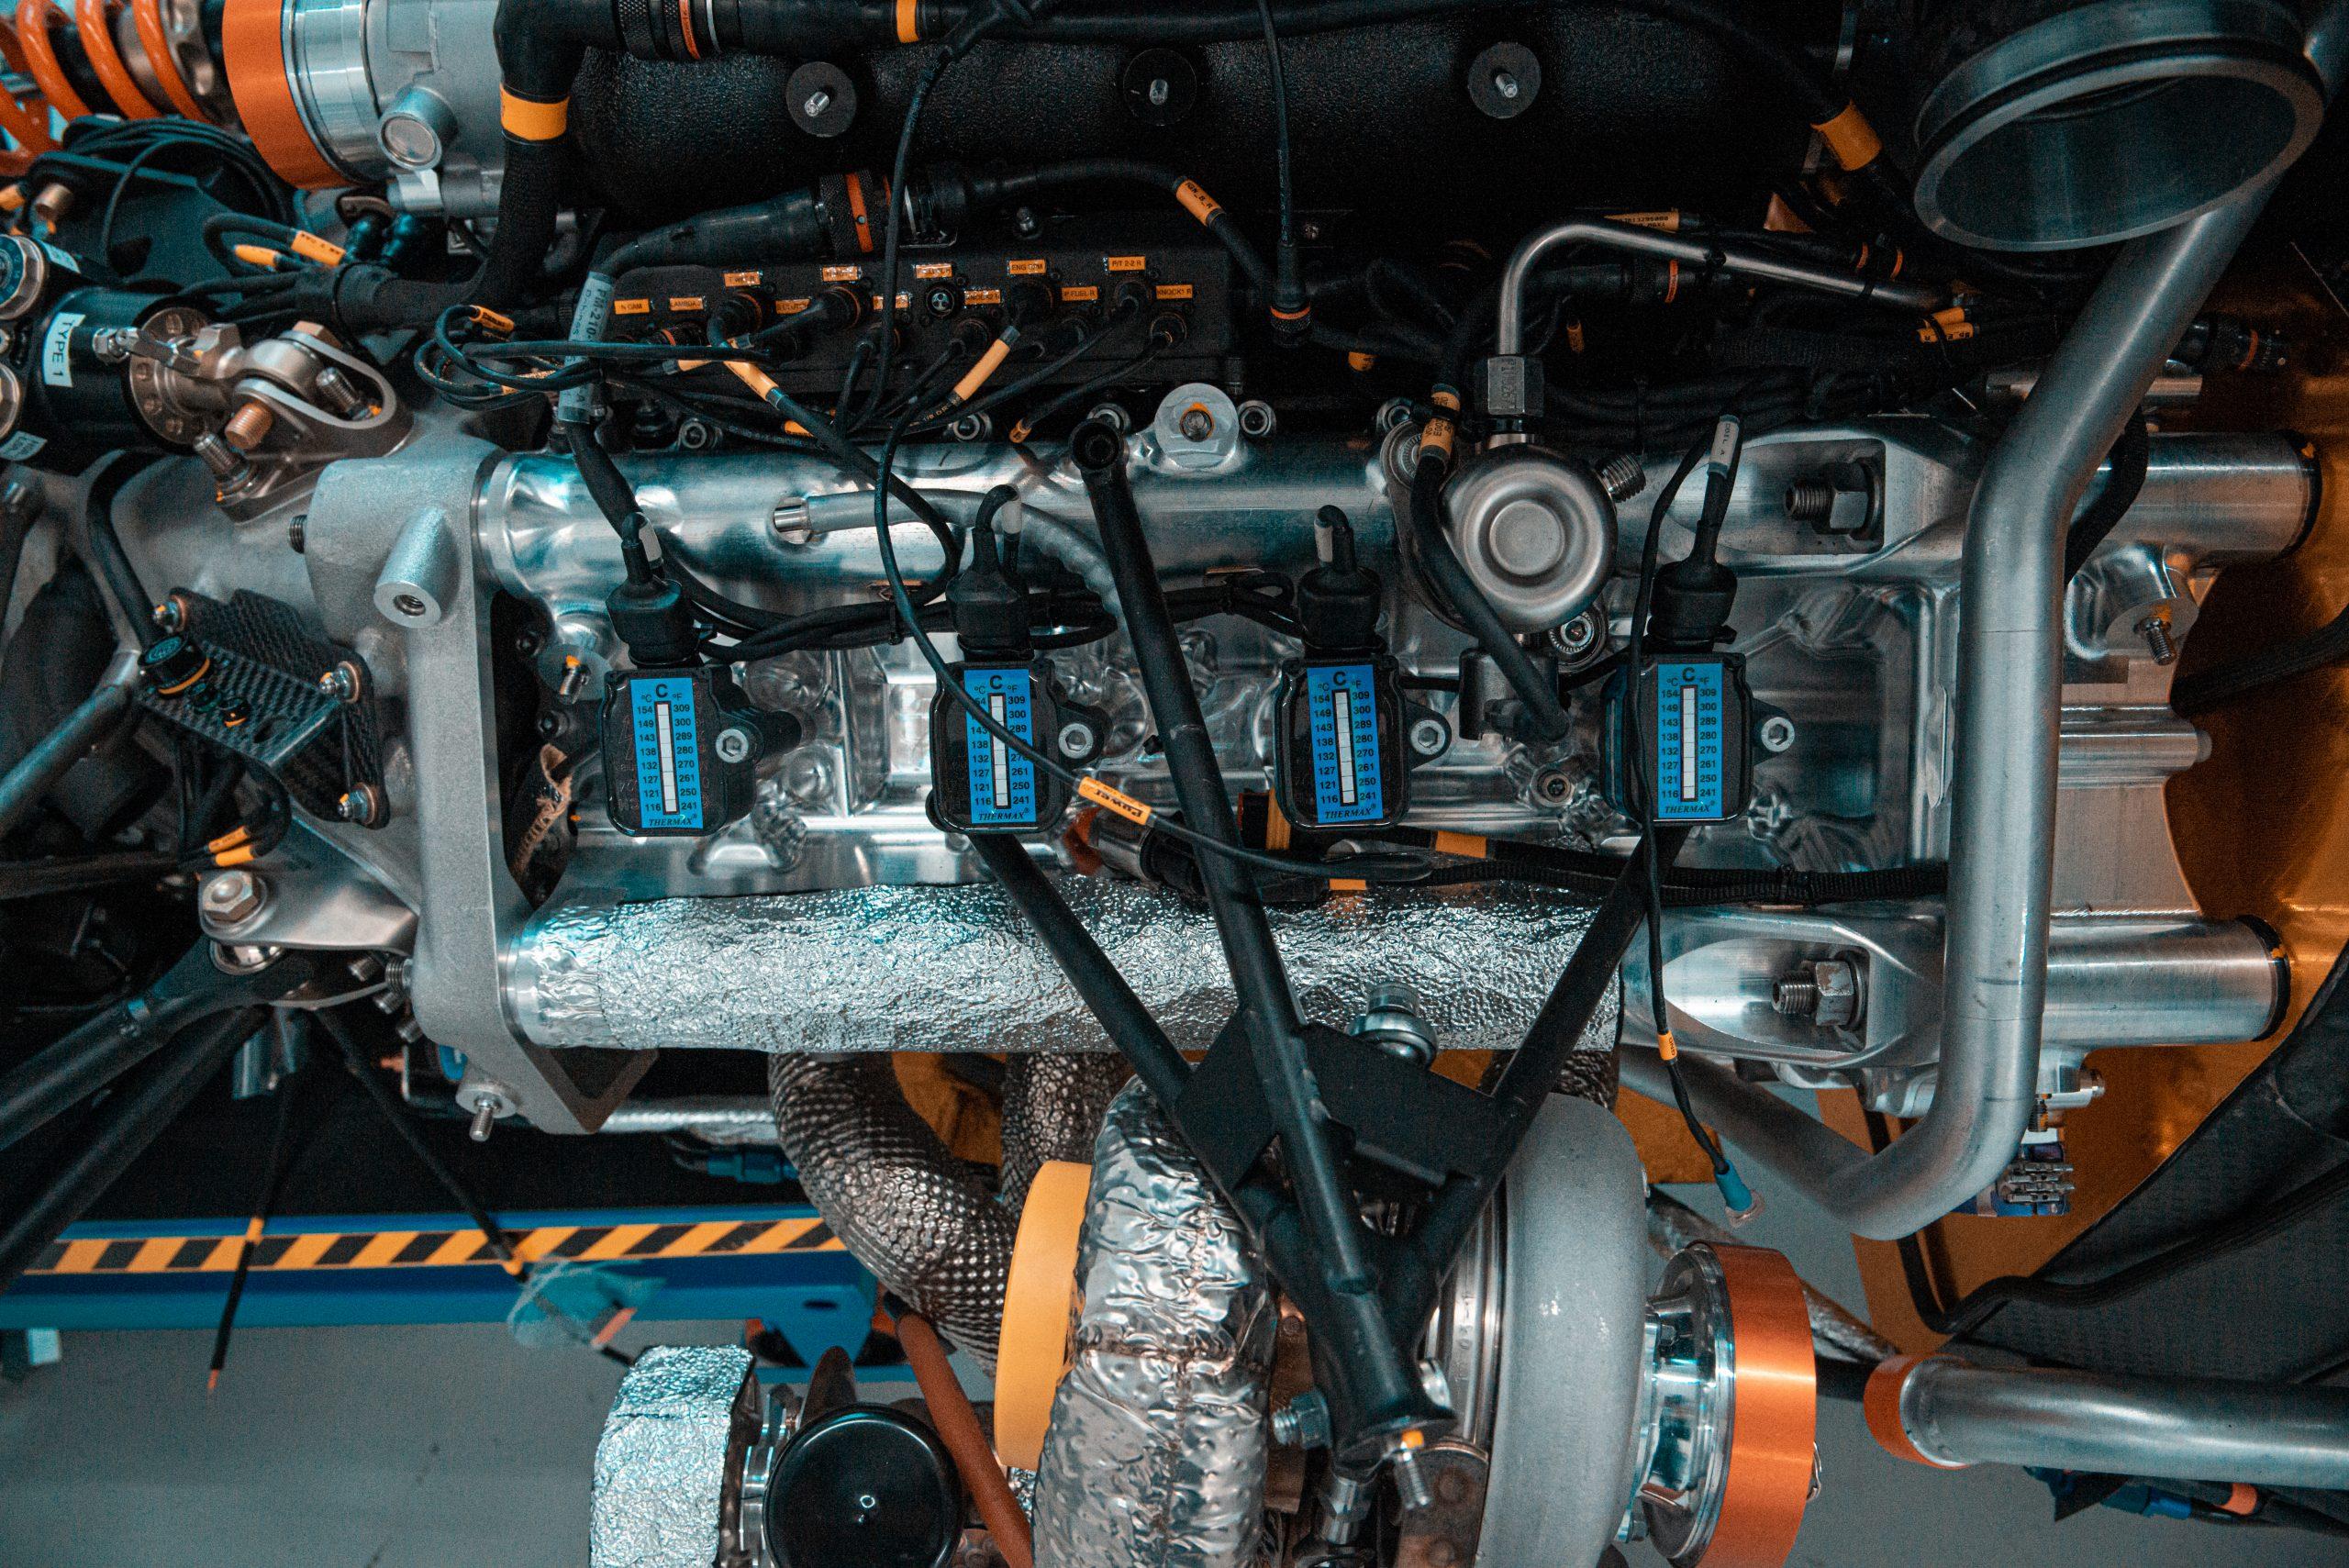 Glickenhaus 007 Hypercar LMH building engine